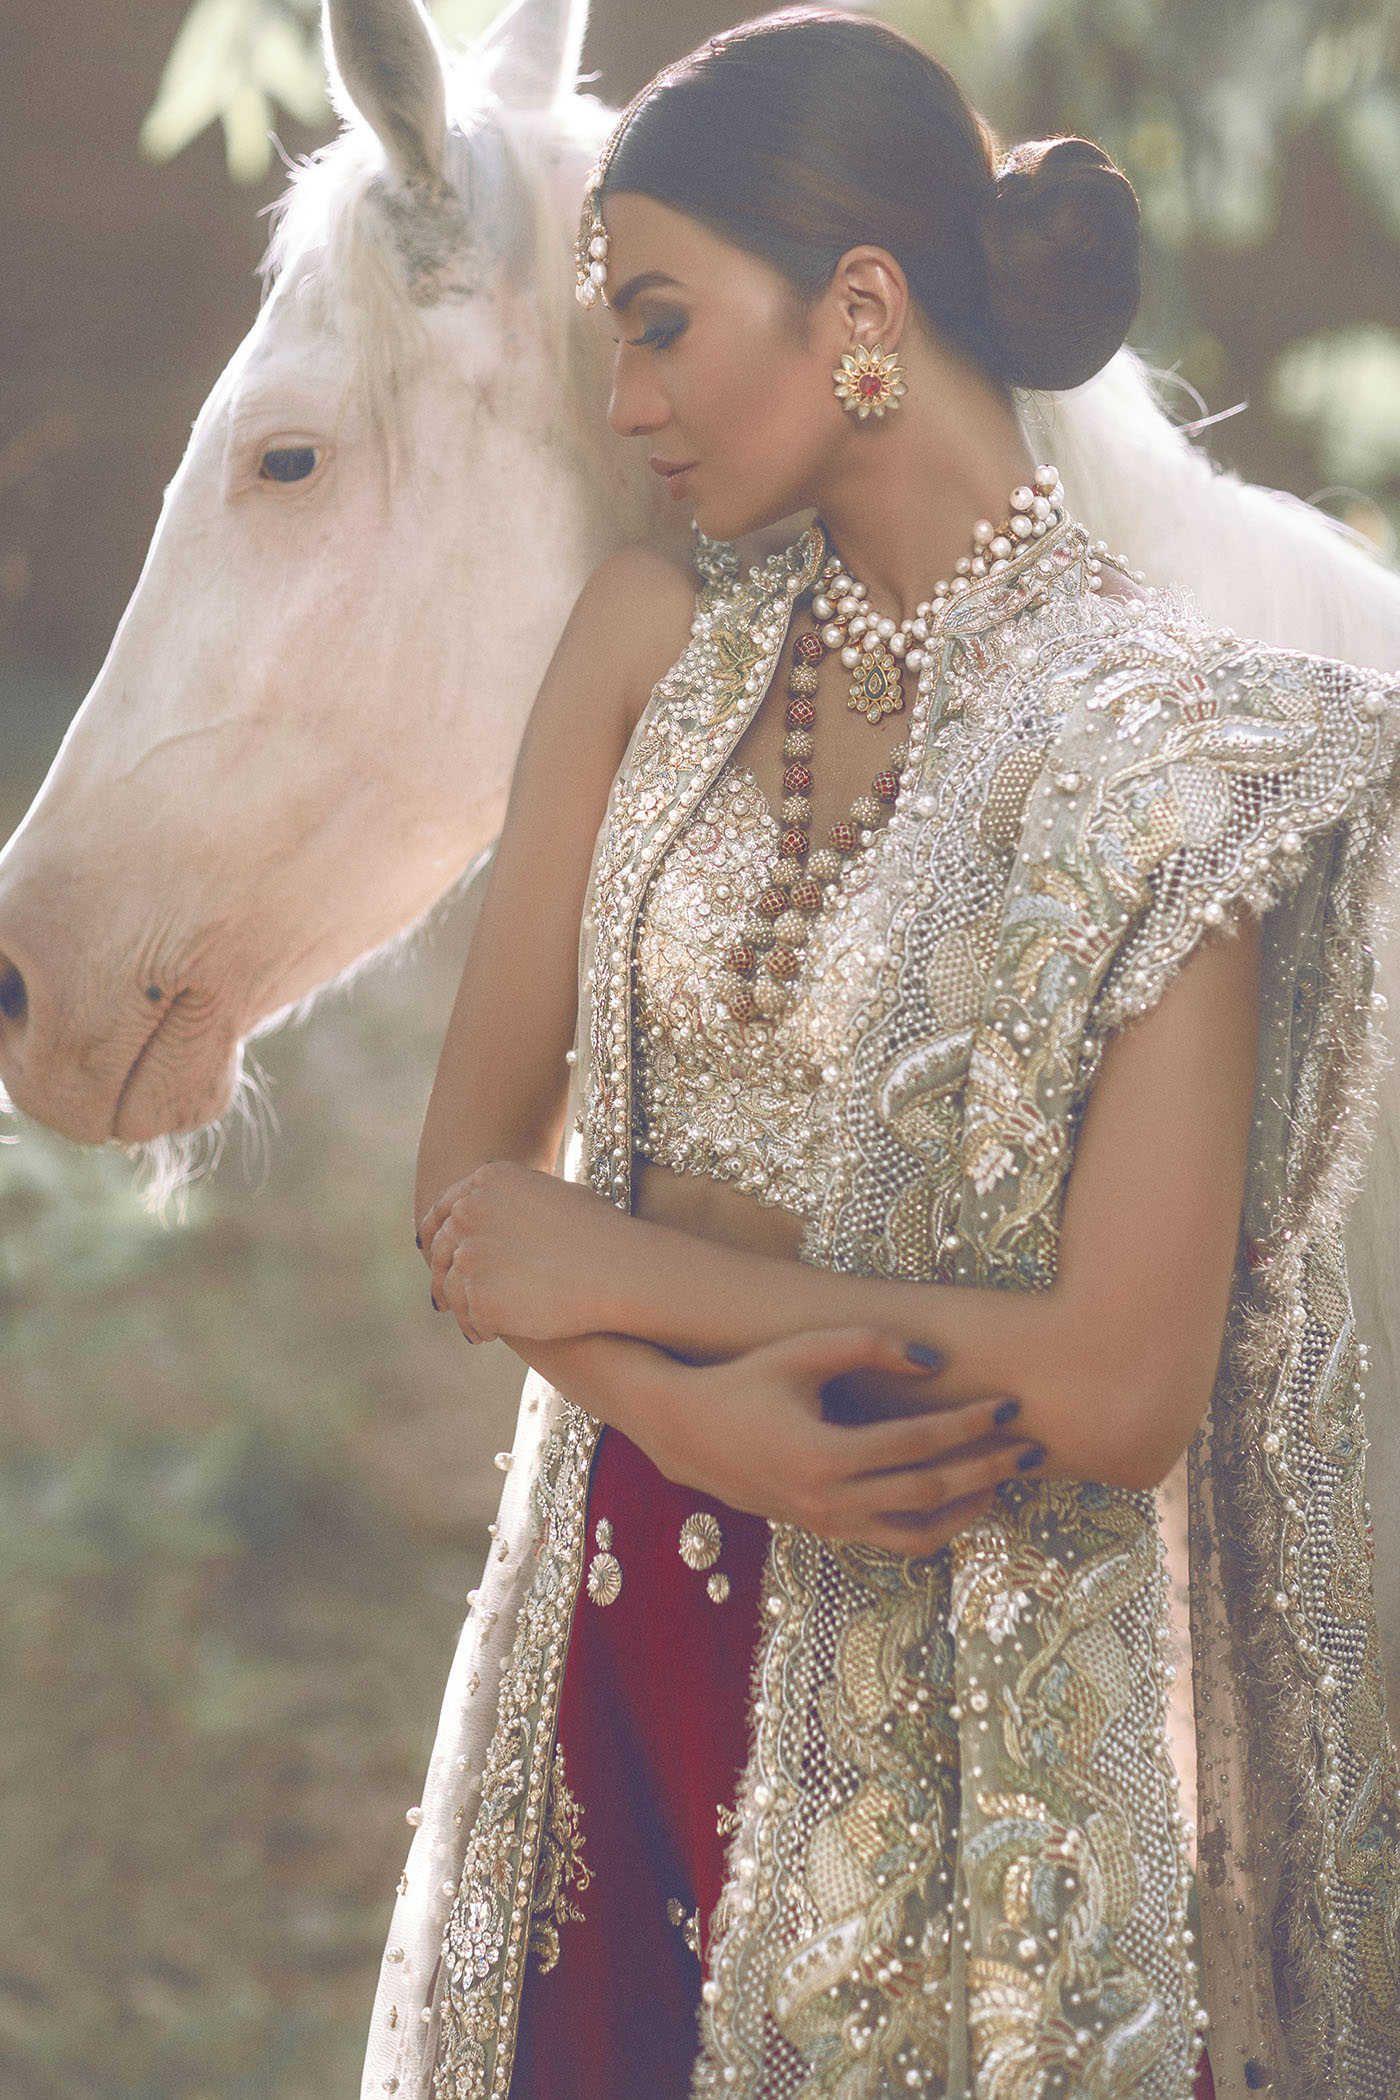 Nilam Patel nilam on Pinterest